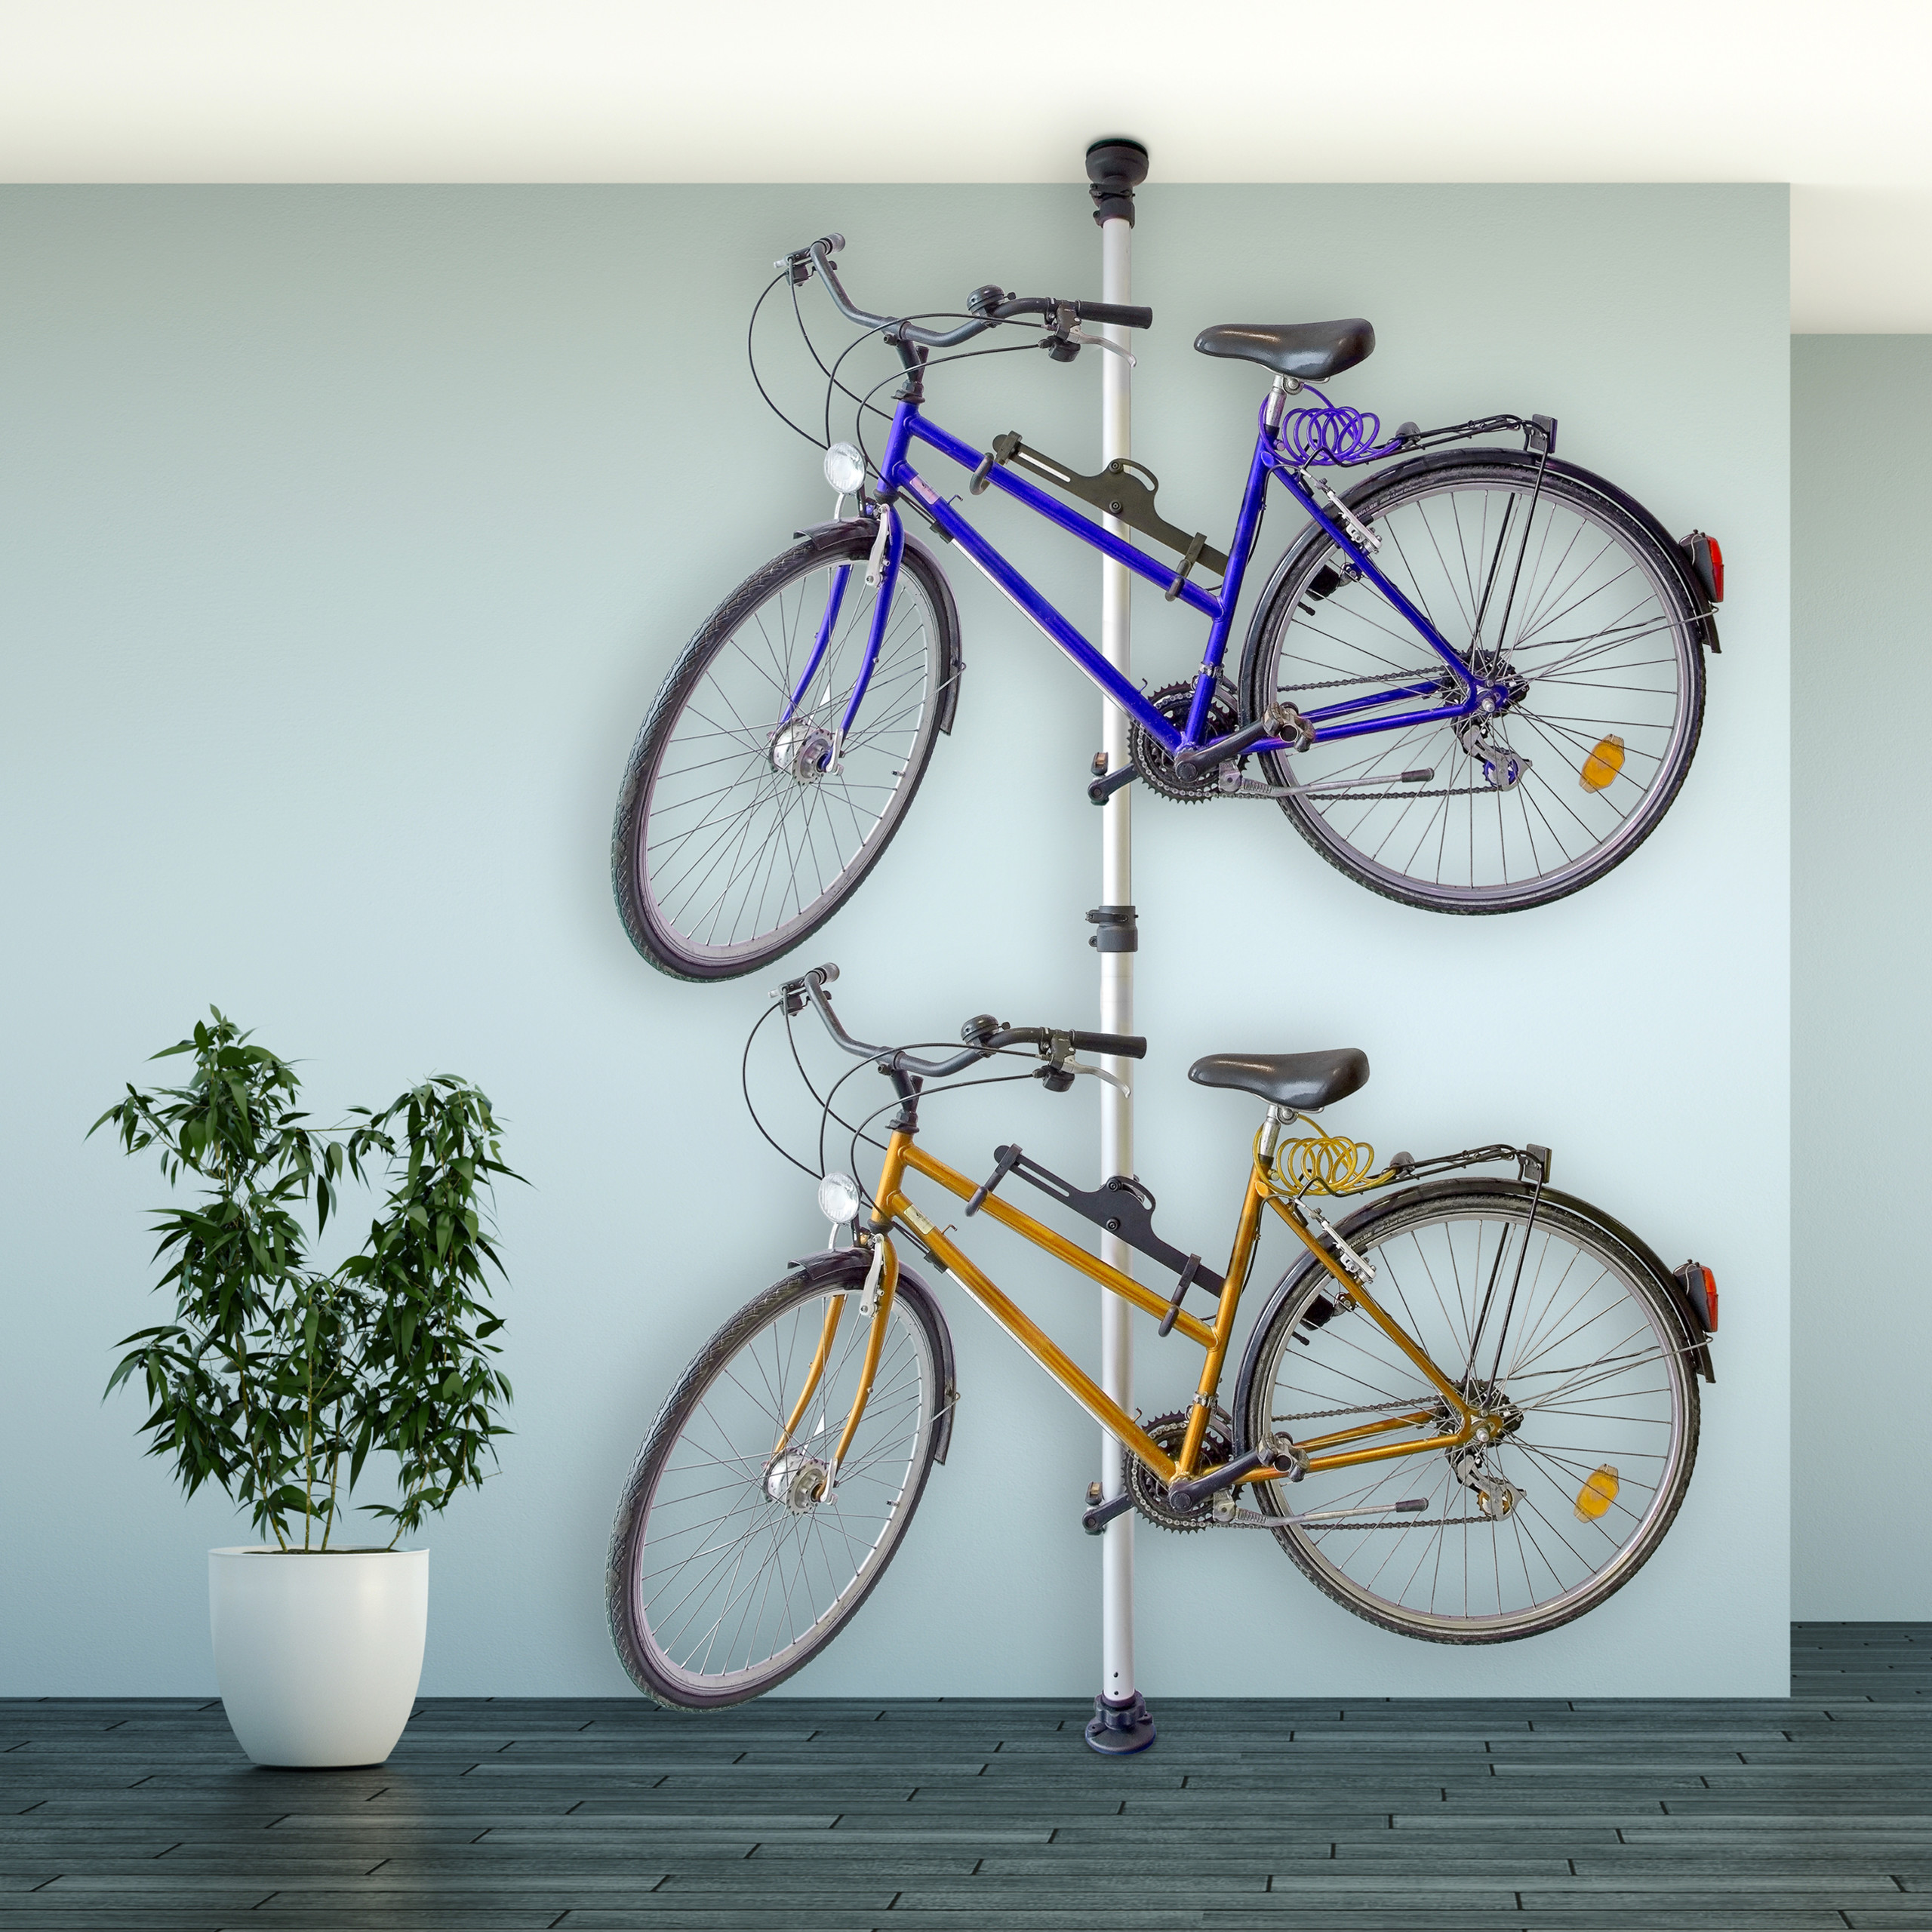 porte v lo range v lo pour 2 bicyclettes accroche support. Black Bedroom Furniture Sets. Home Design Ideas